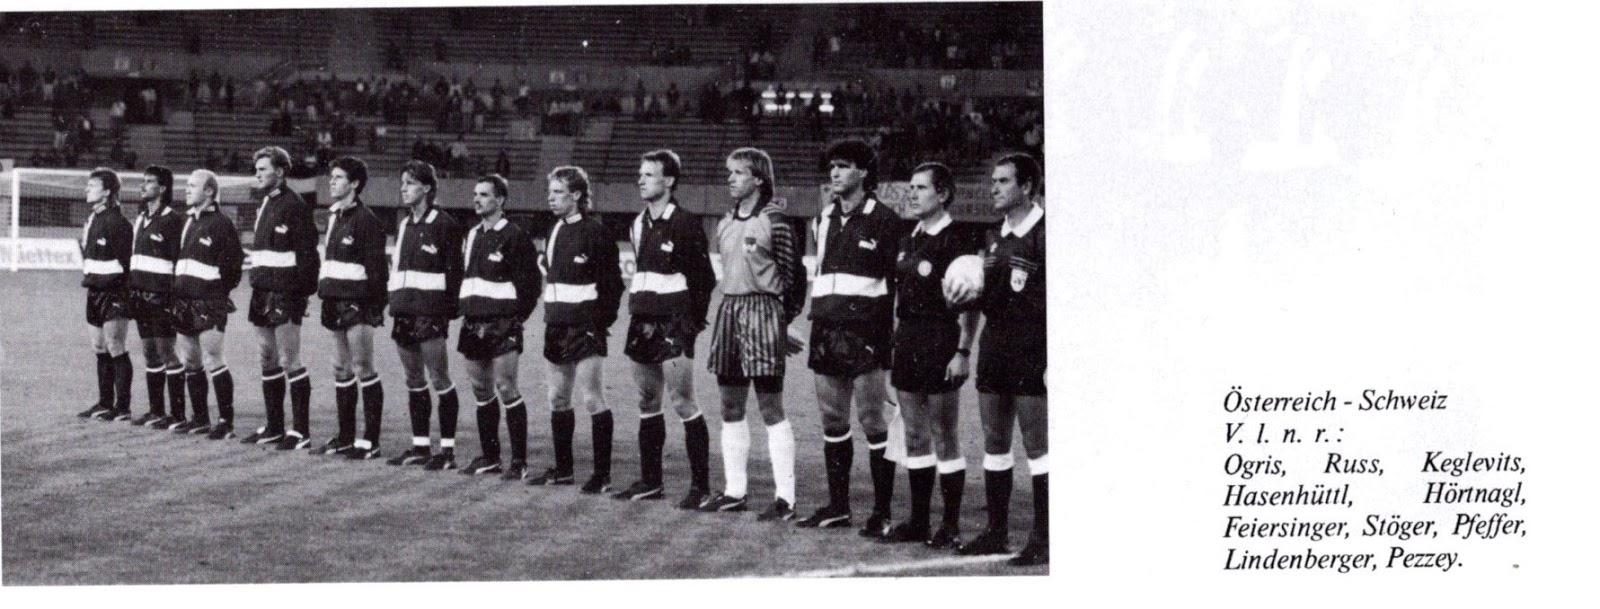 soccer nostalgia international season 1990 91, part 1 and  fu%c3%83%c2%9fball shorts c 24 #9